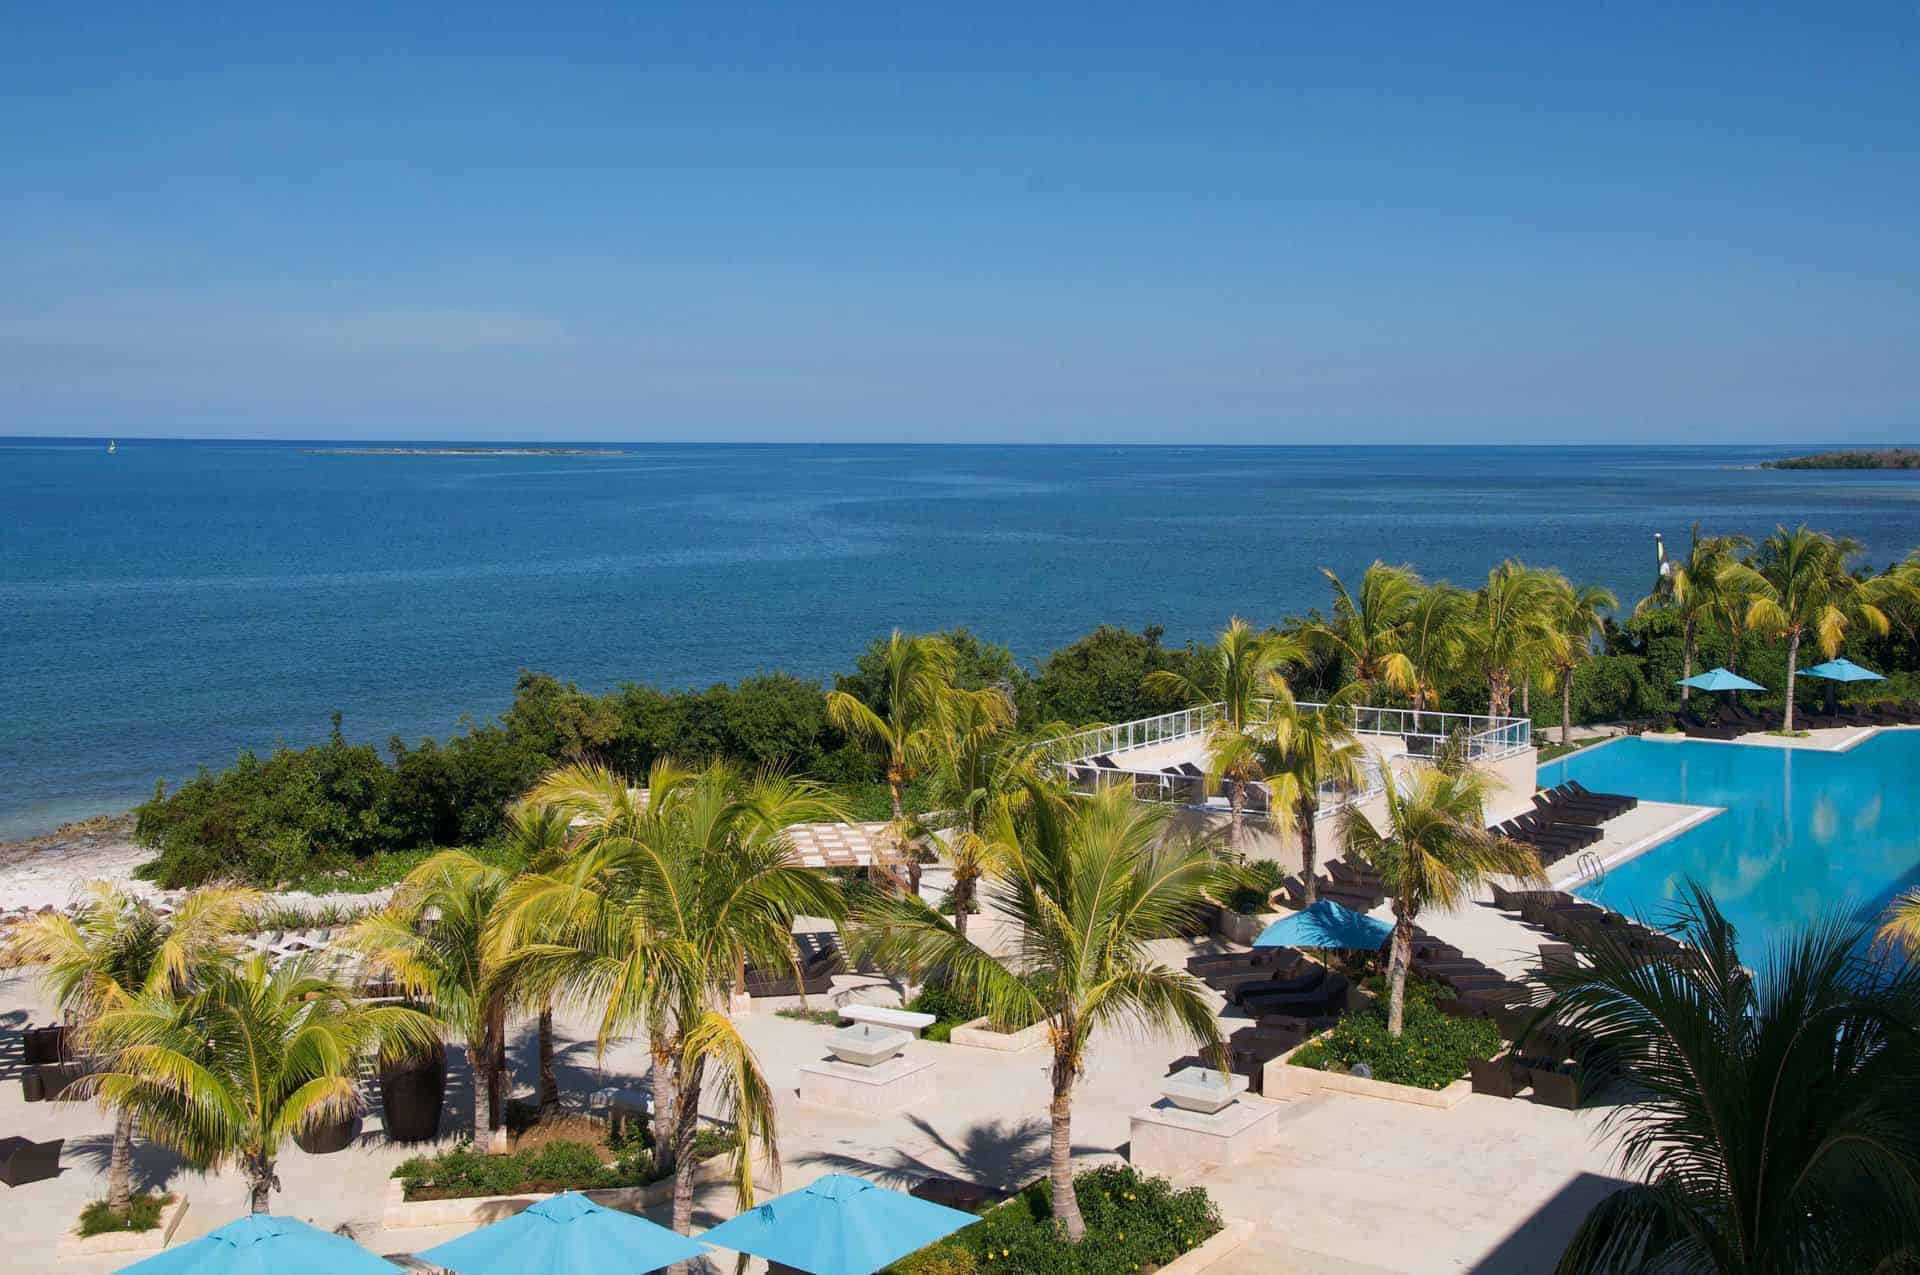 cayo santa maria hotel piscine palmiers plage mer cuba autrement